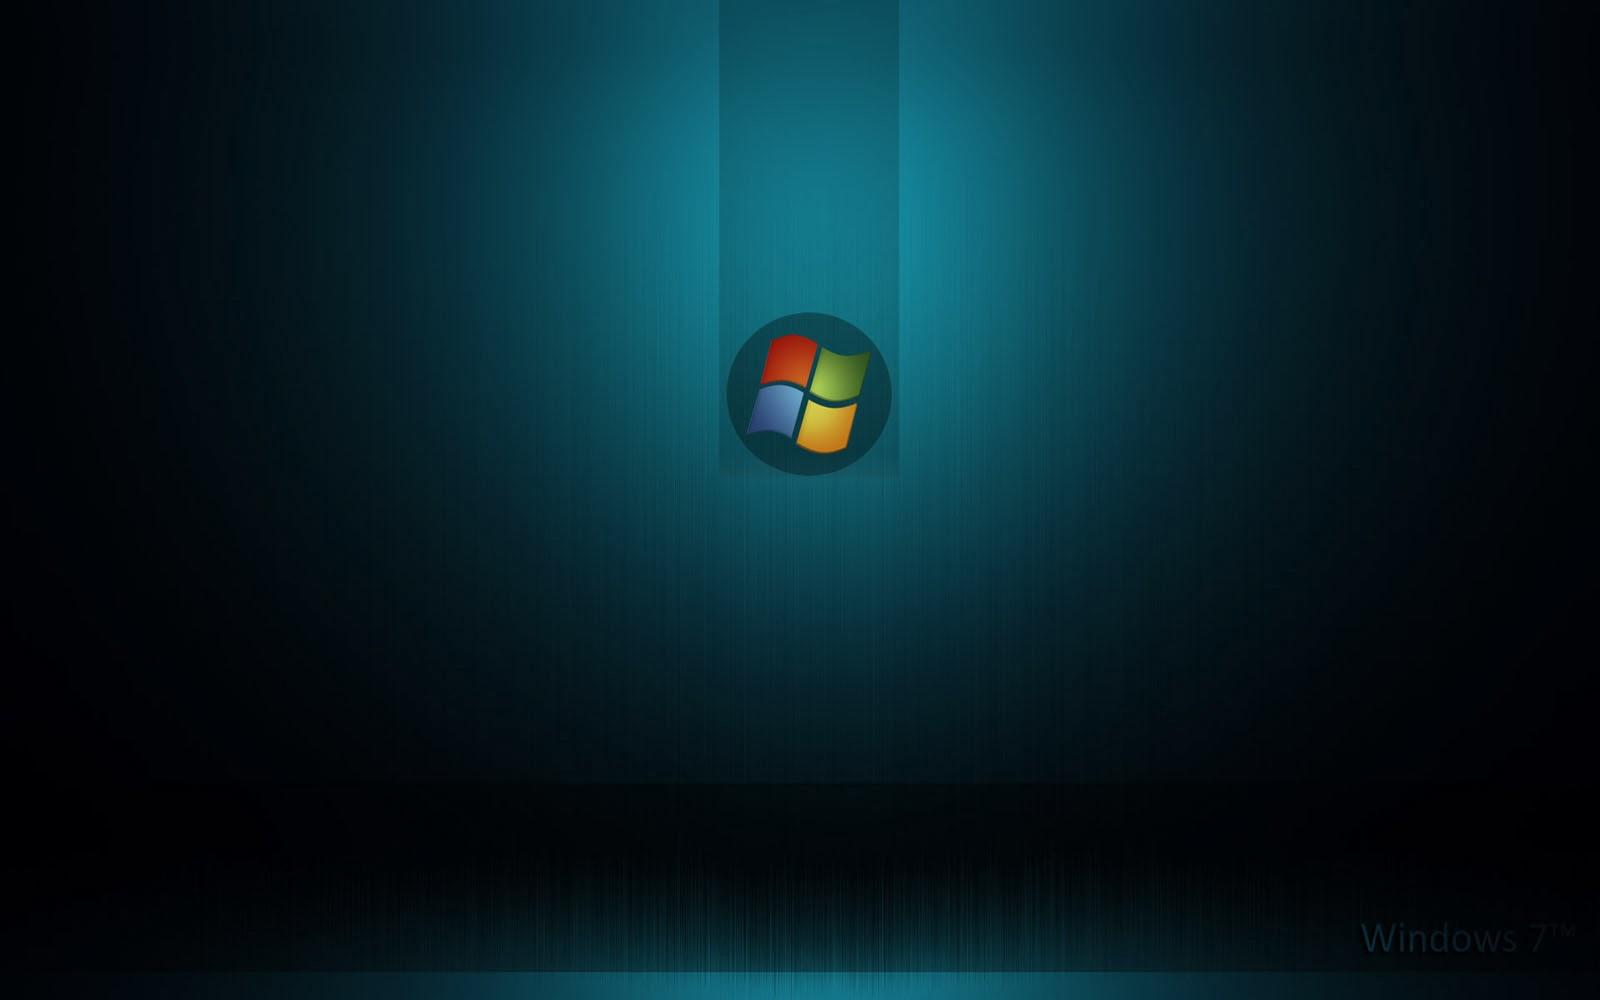 wallpapers Microsoft Windows Wallpapers 1600x1000